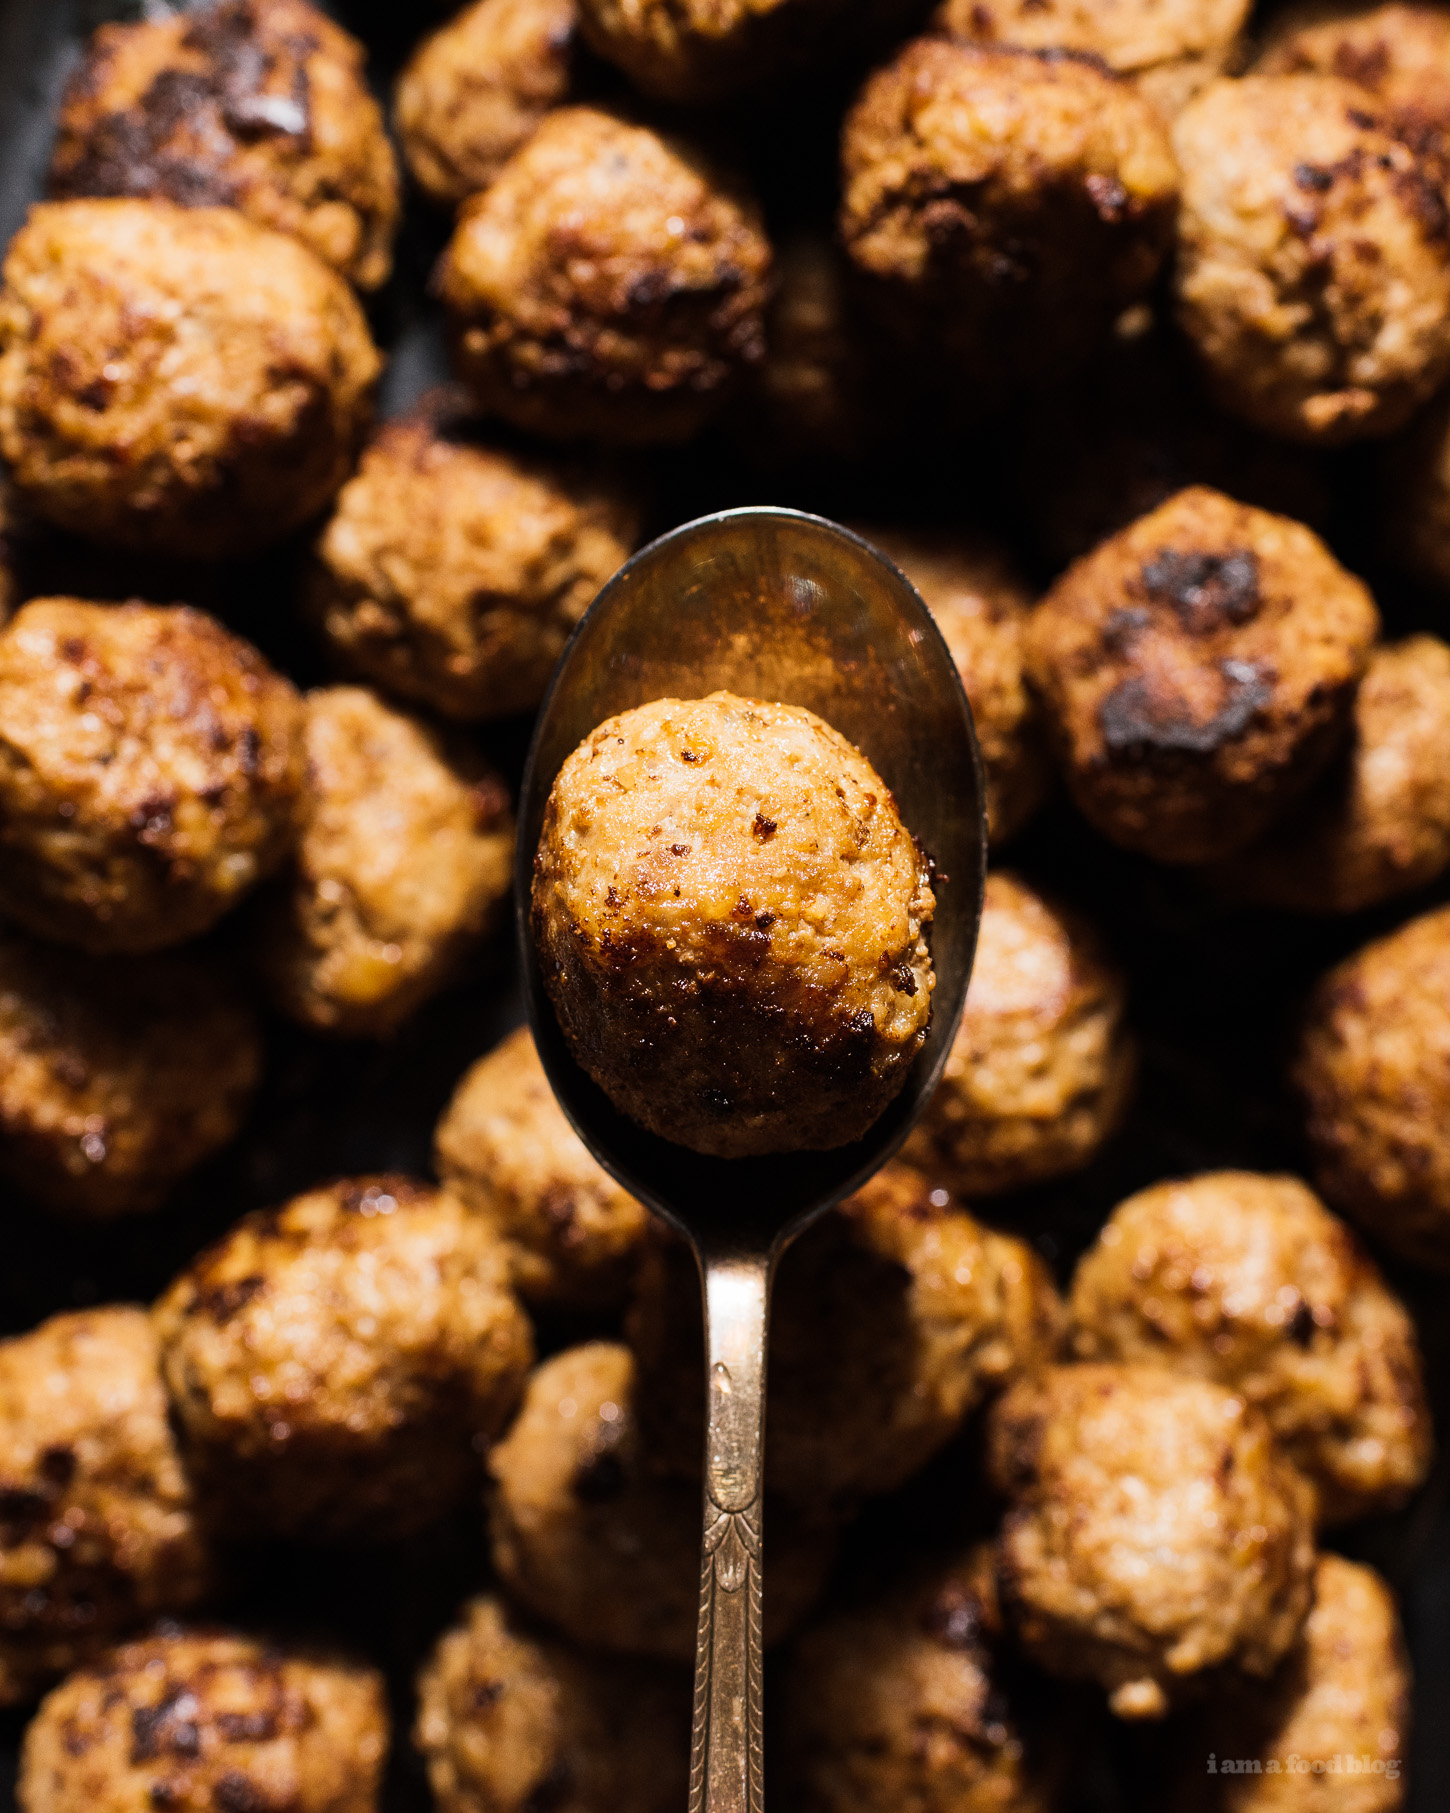 Swedish Meatballs with Cream Sauce | www.iamafoodblog.com